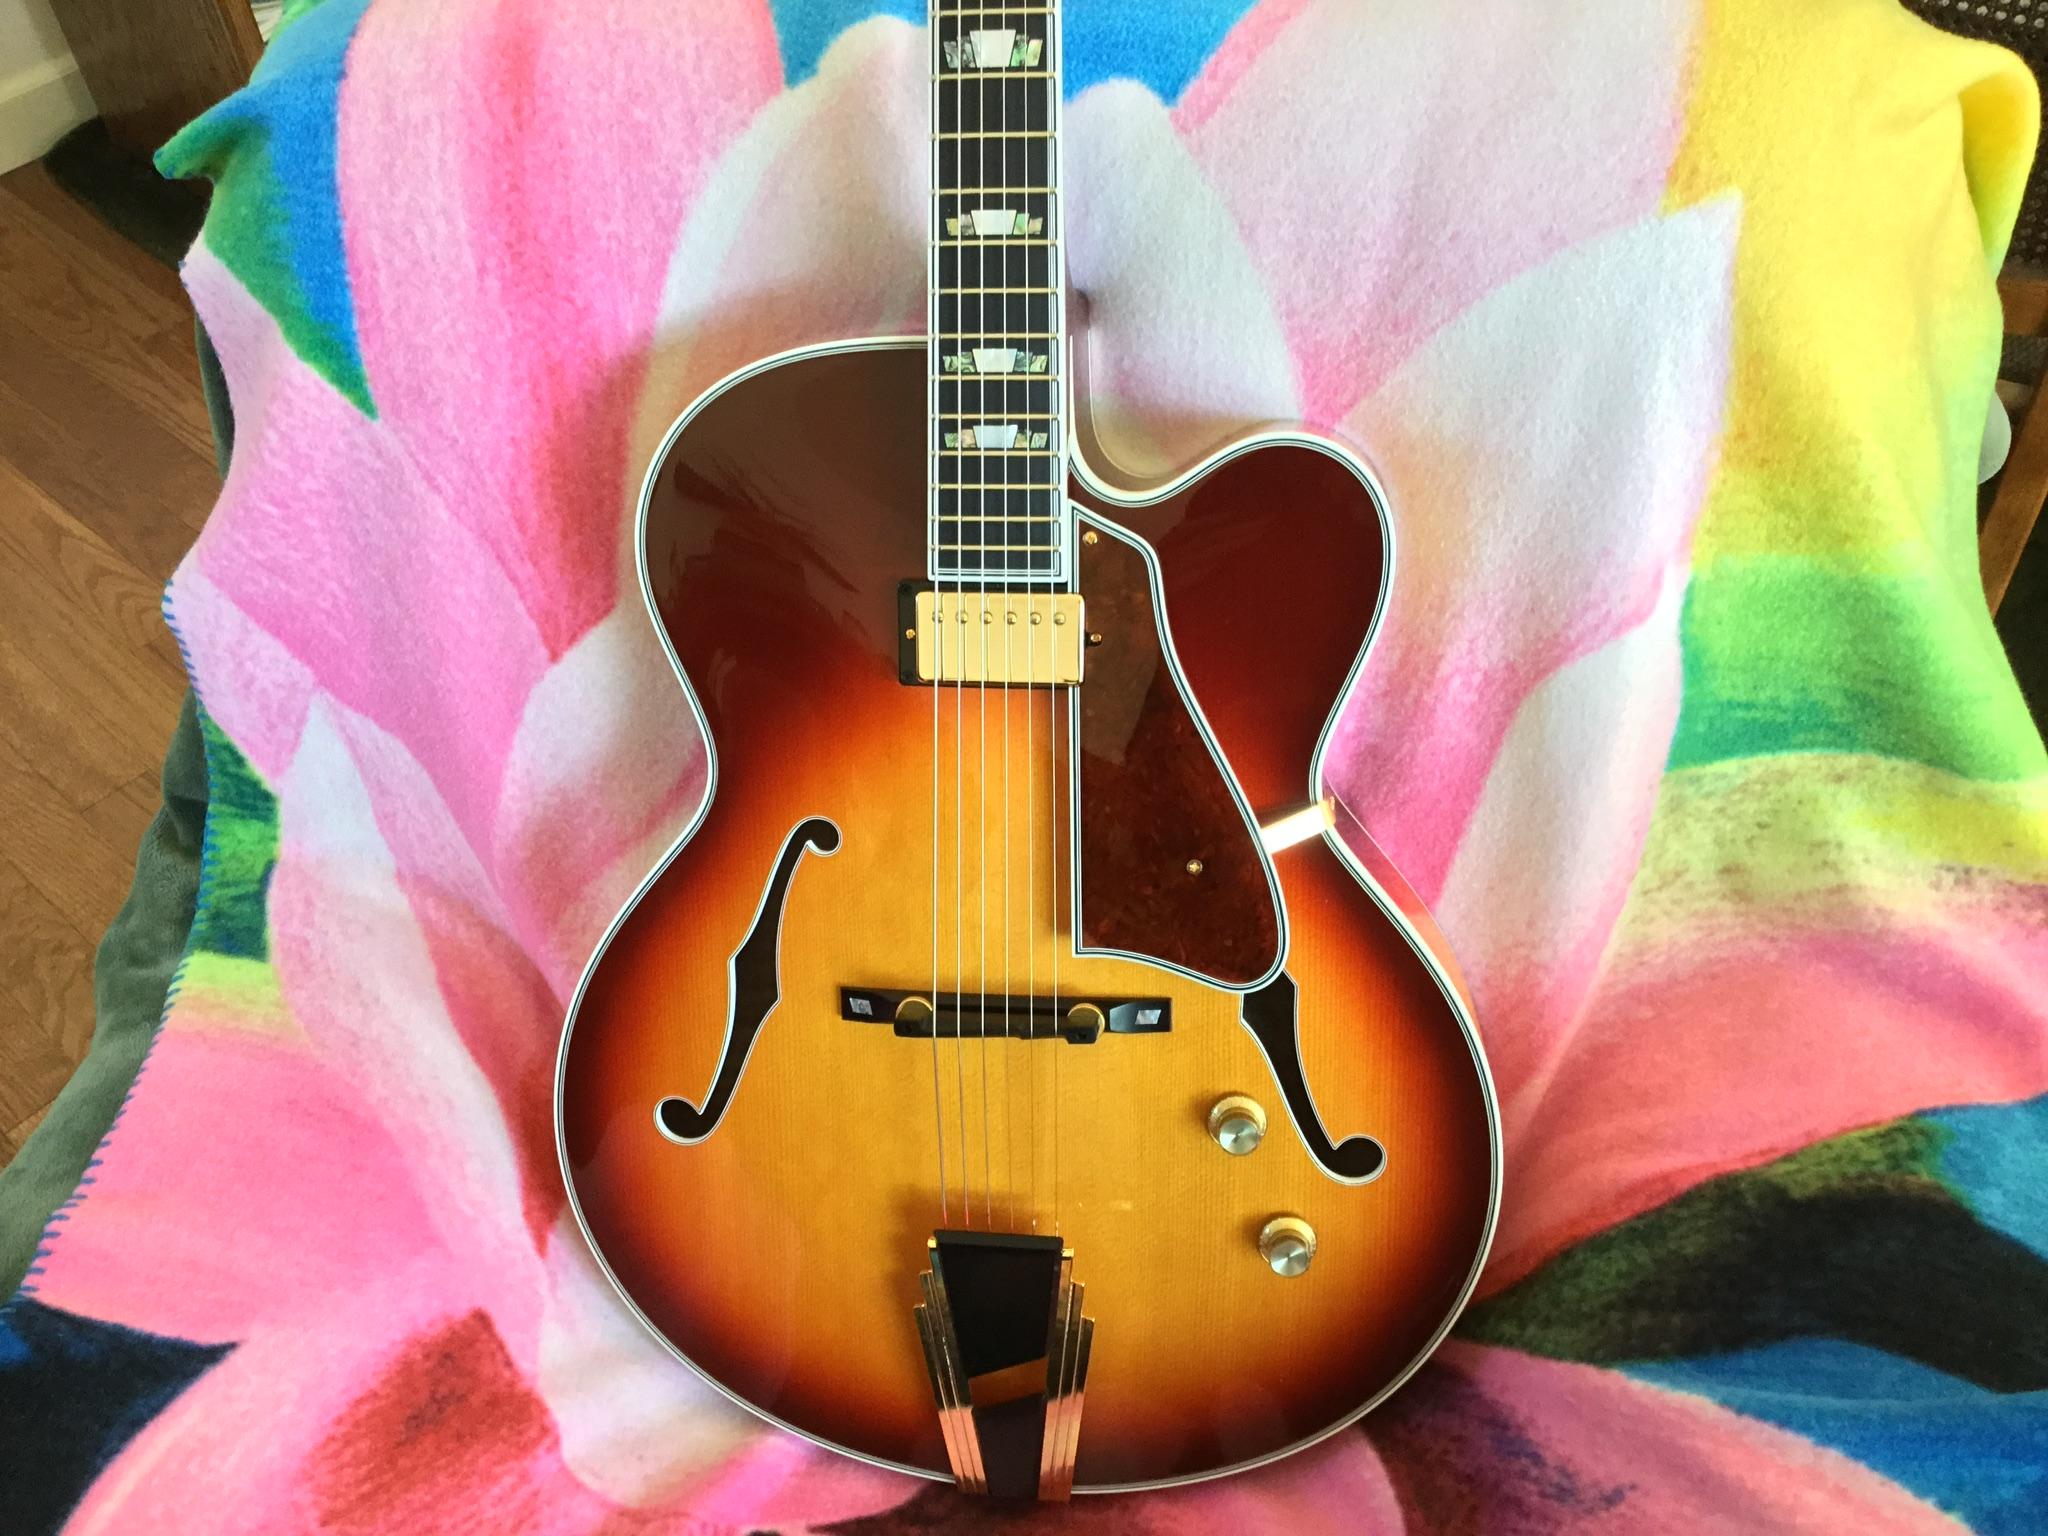 Dream guitar buying issues-7eacd131-4dcf-4049-b632-dd7000679157-jpeg